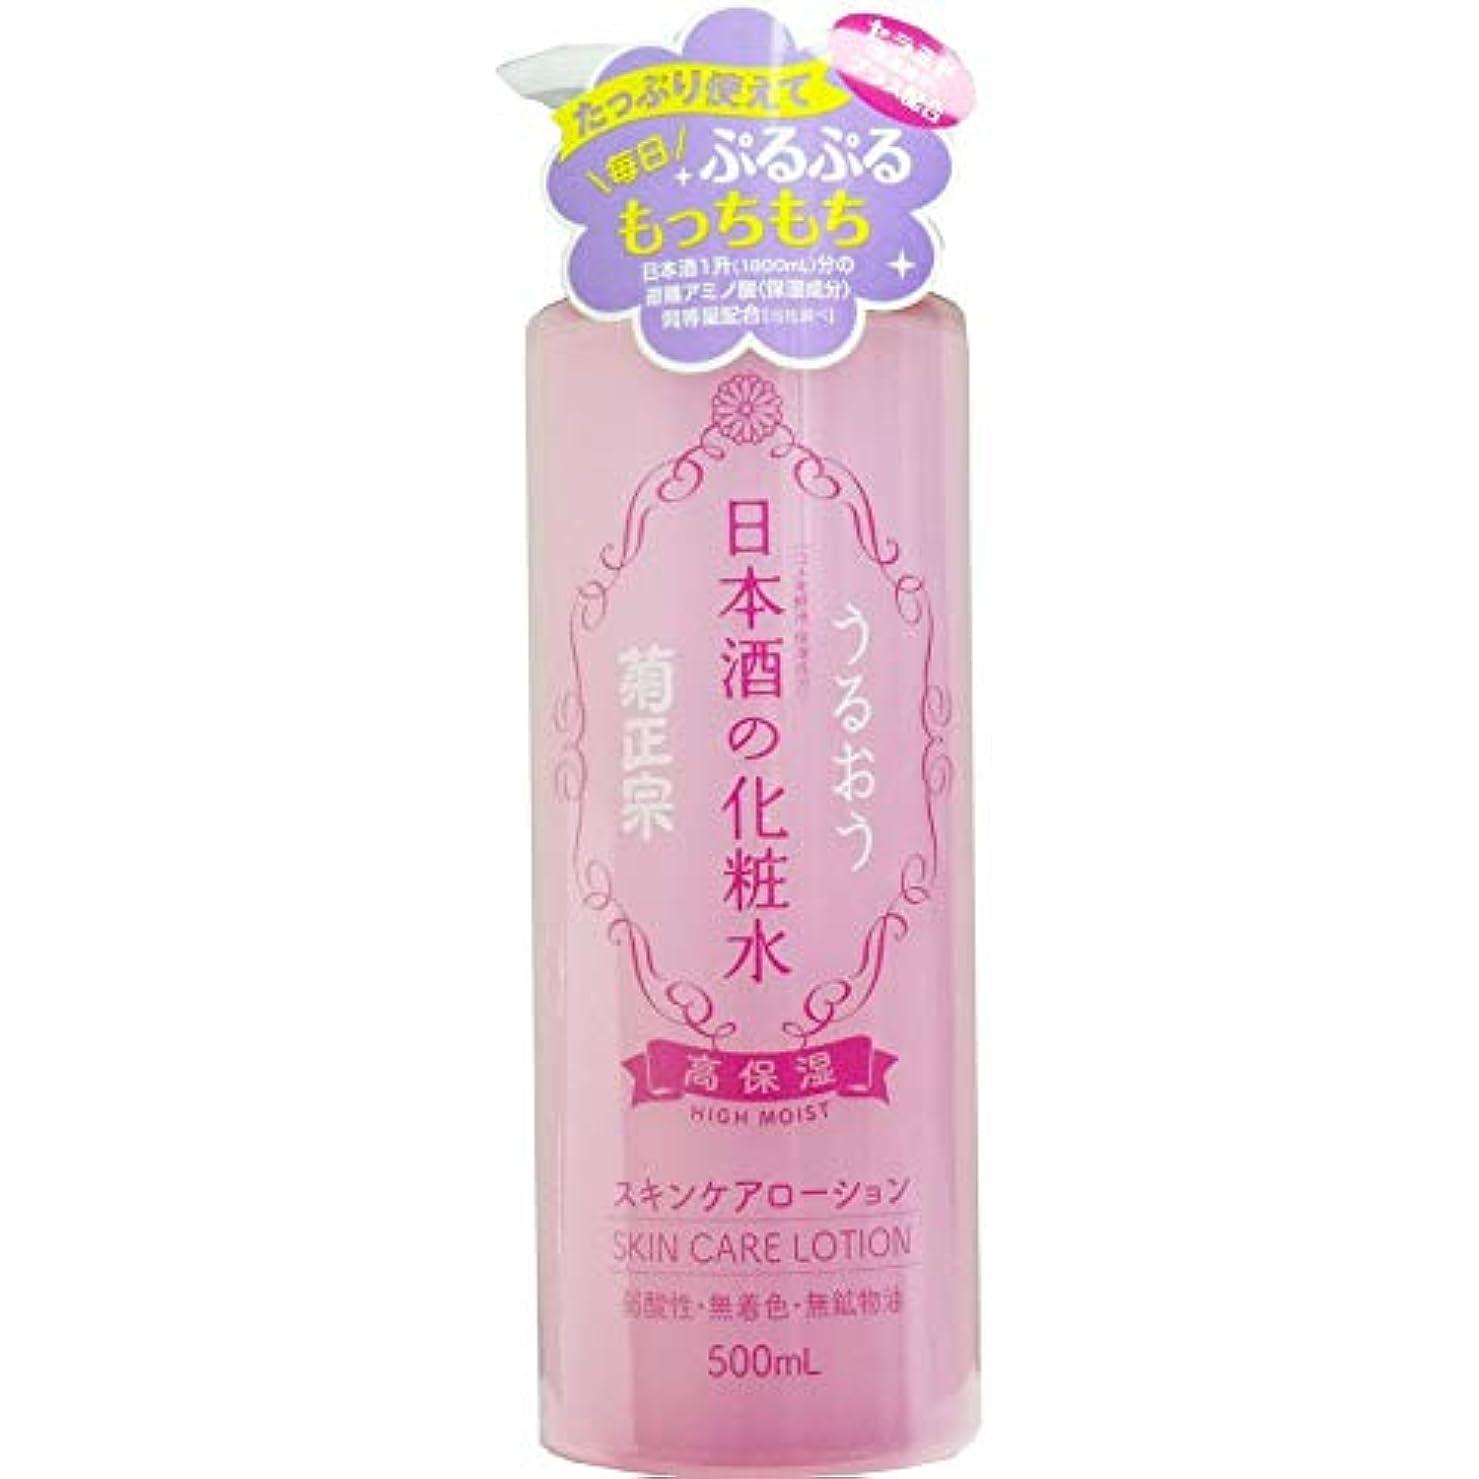 旅化粧雑草日本酒の化粧水 菊政宗 化粧水 500ml×2本セット